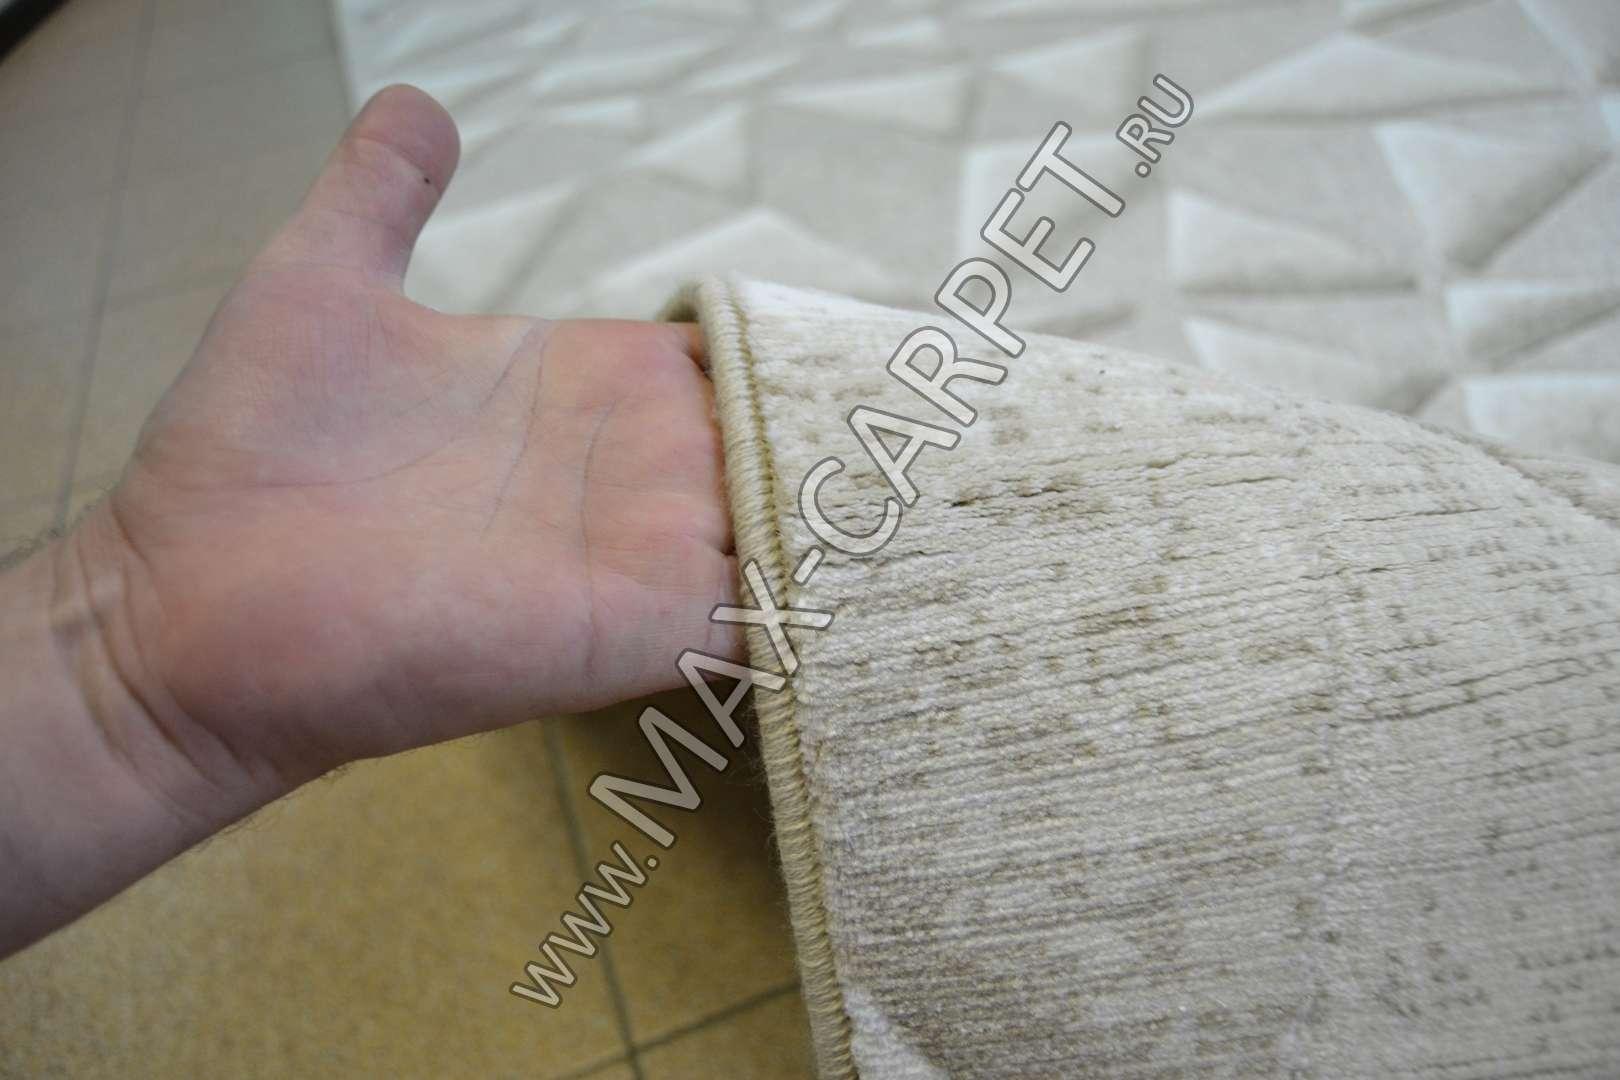 Бельгийские ковры Osta Piazzo 12192 100